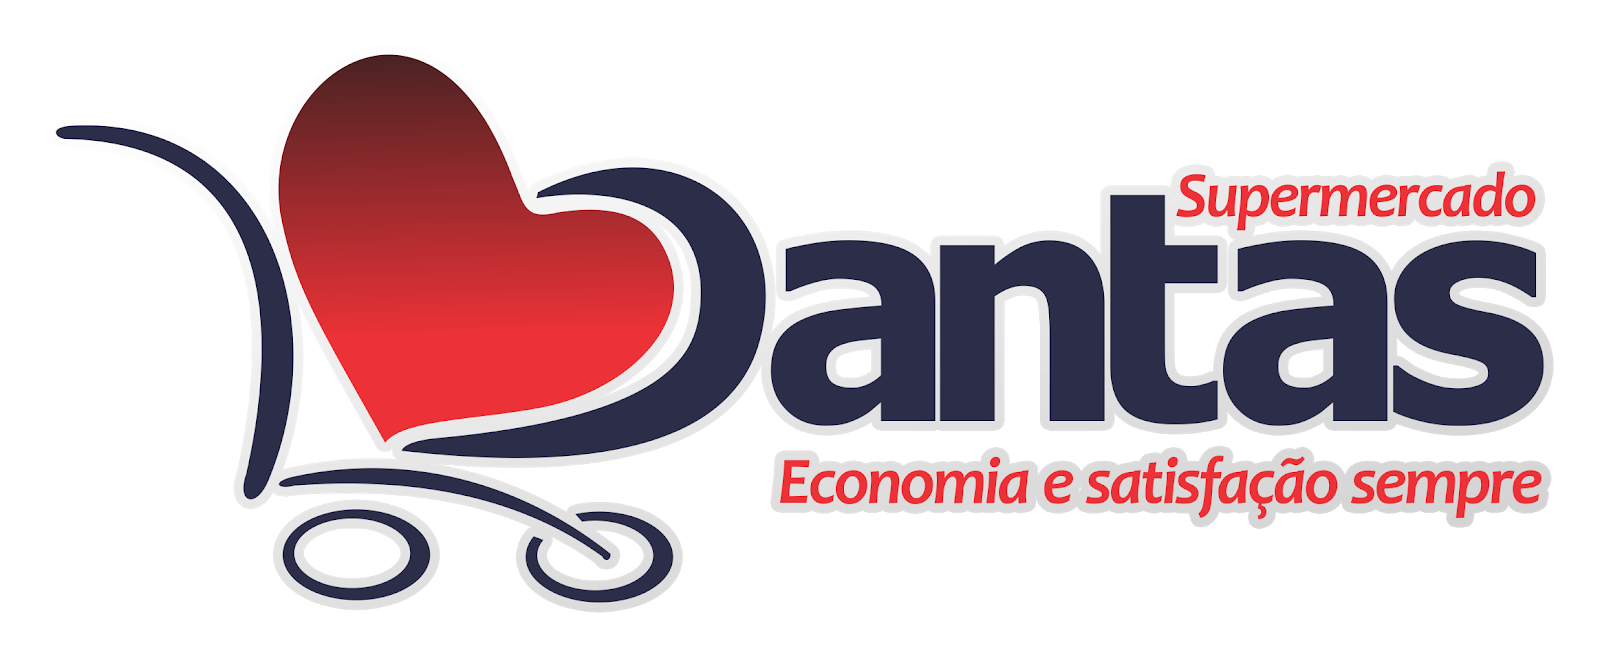 Supermercado Dantas